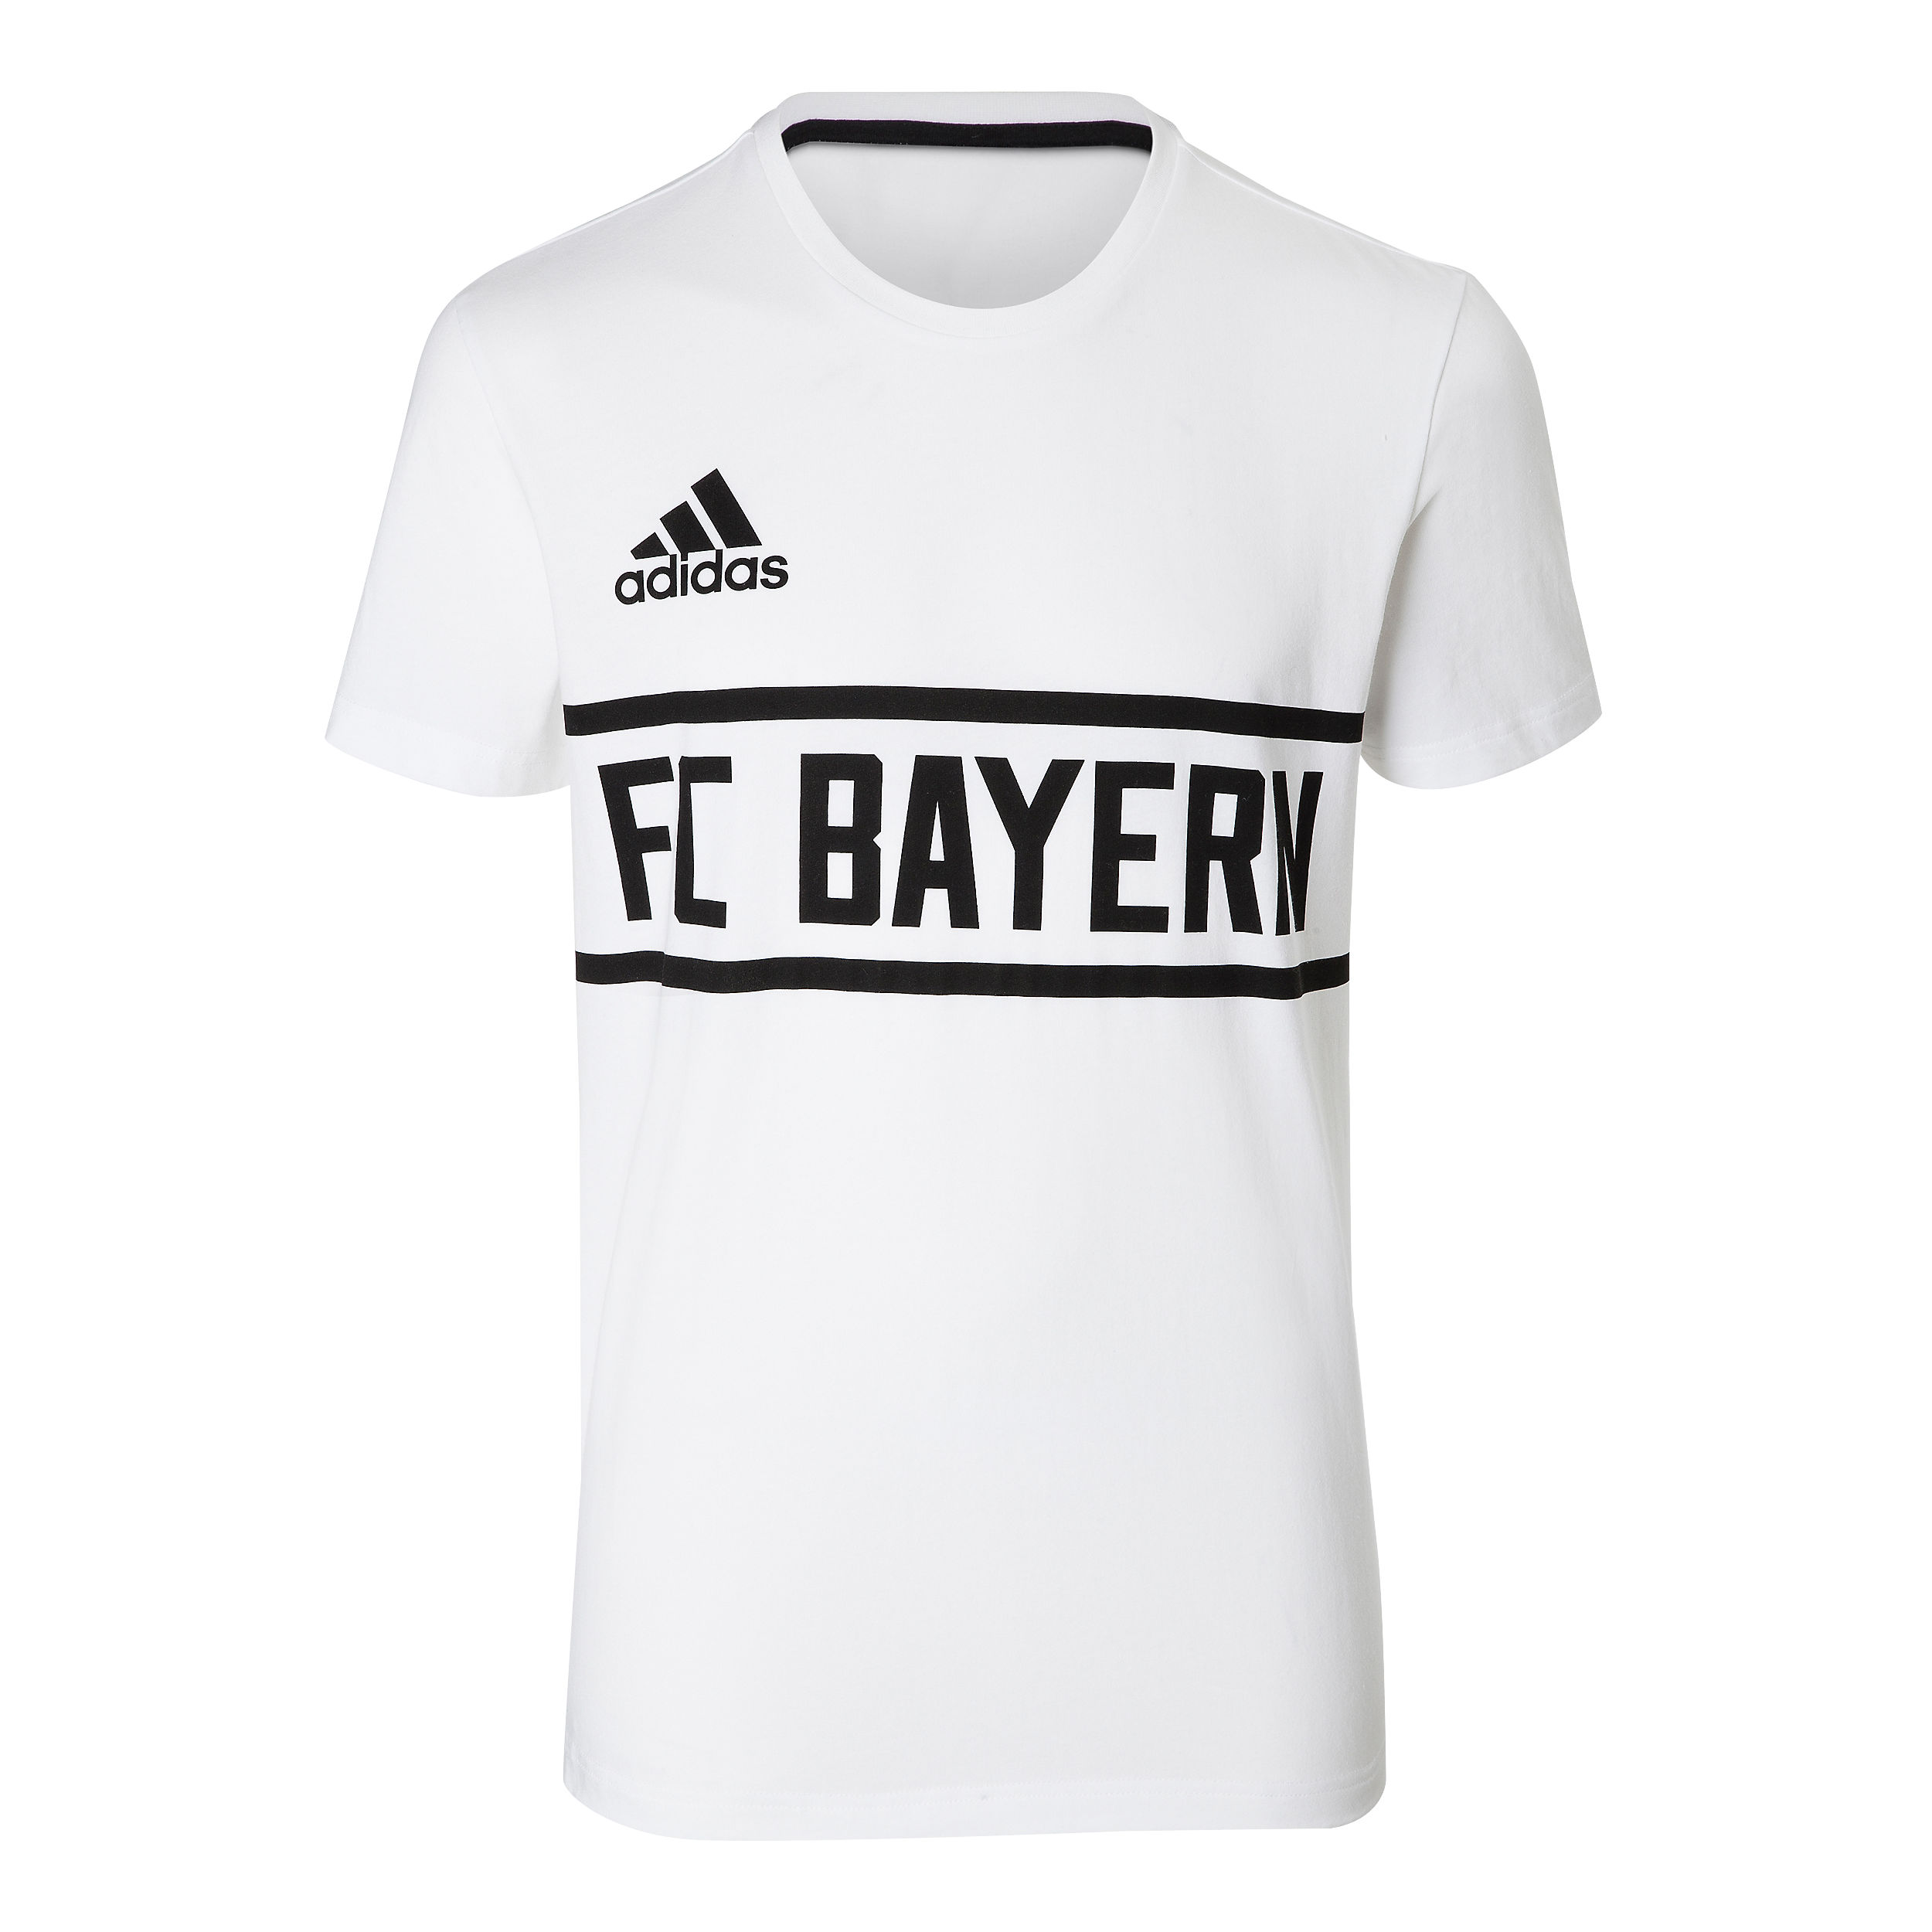 5e016595186 2017-2018 Bayern Munich Adidas Graphic 1900 Lifestyle Tee (White) [BS0135]  - Uksoccershop